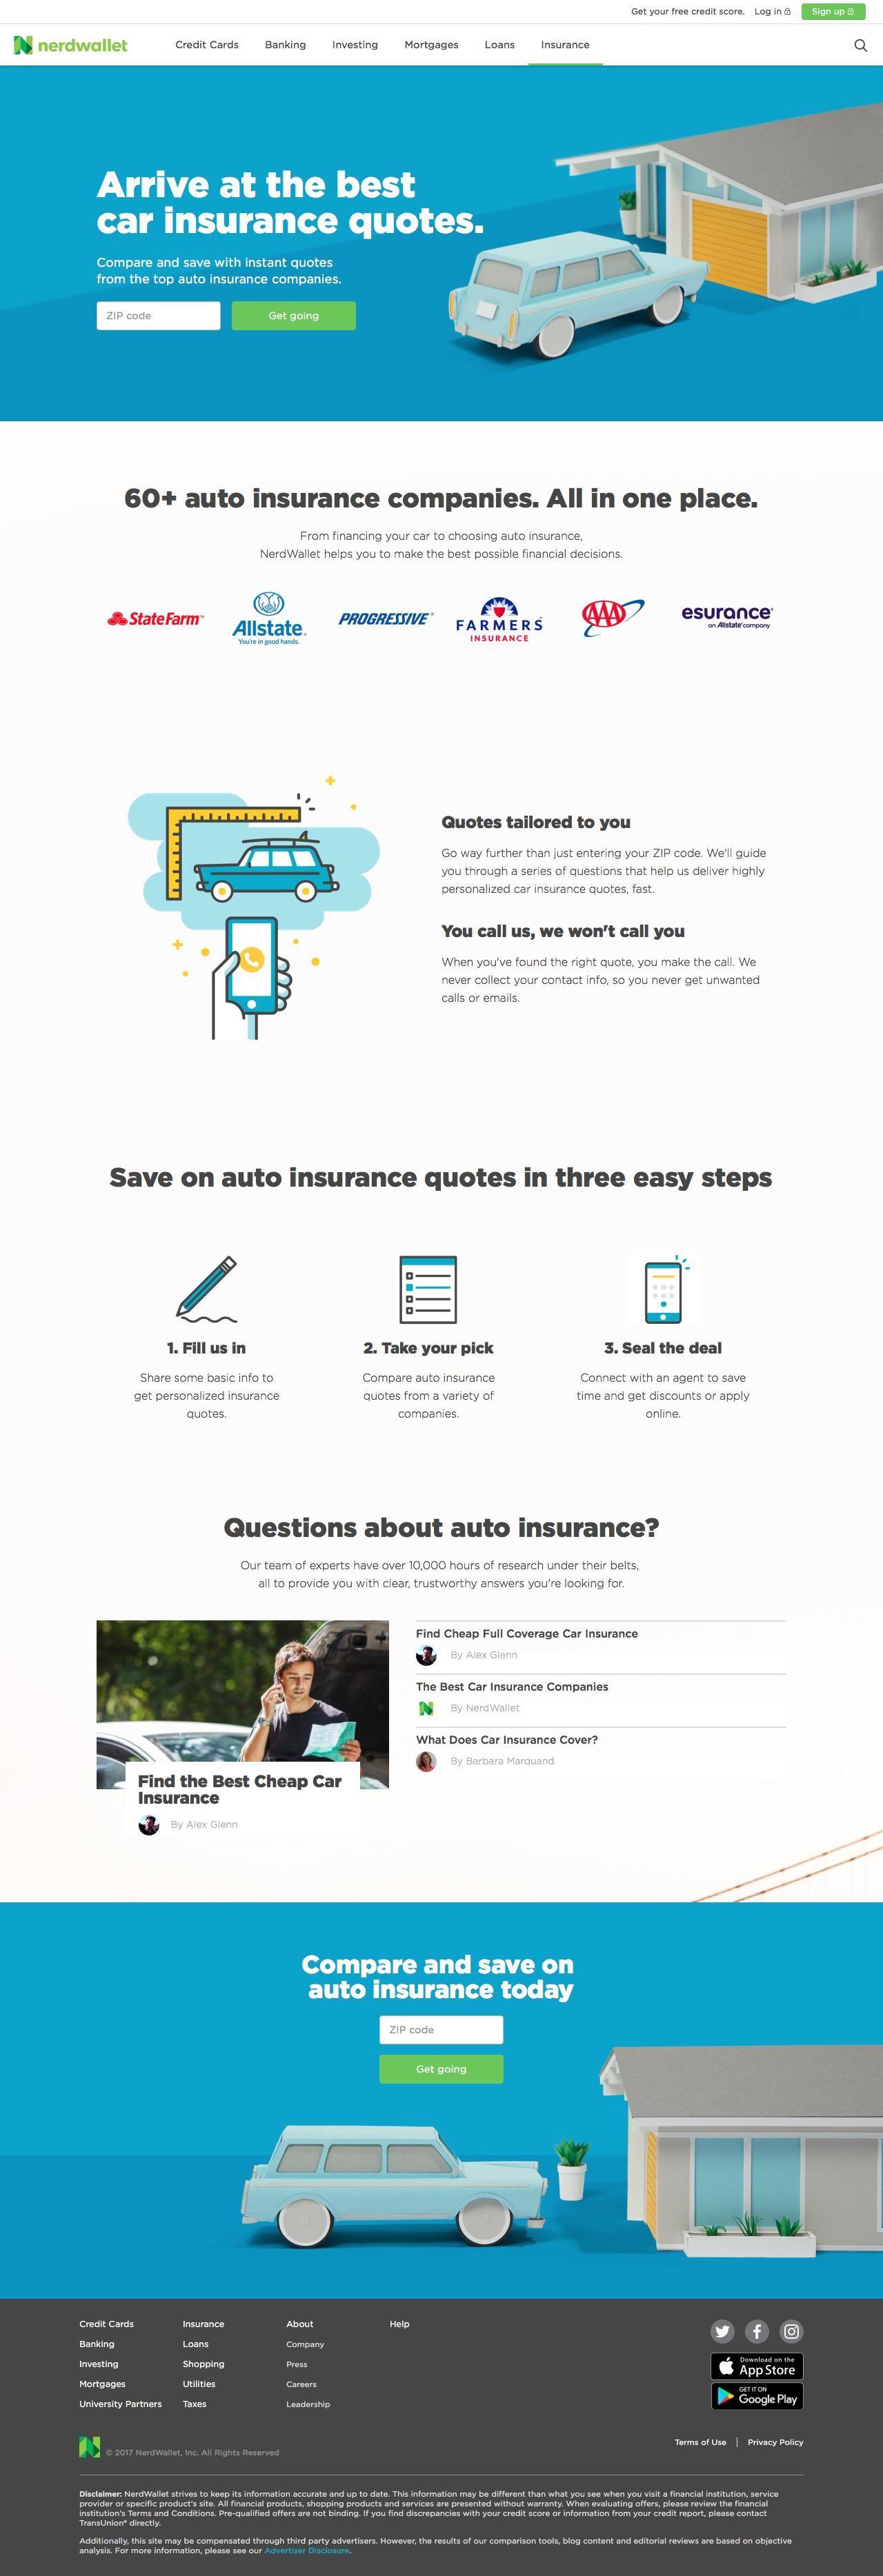 Nerdwallet com compare car insurance rates captured april 4 2017